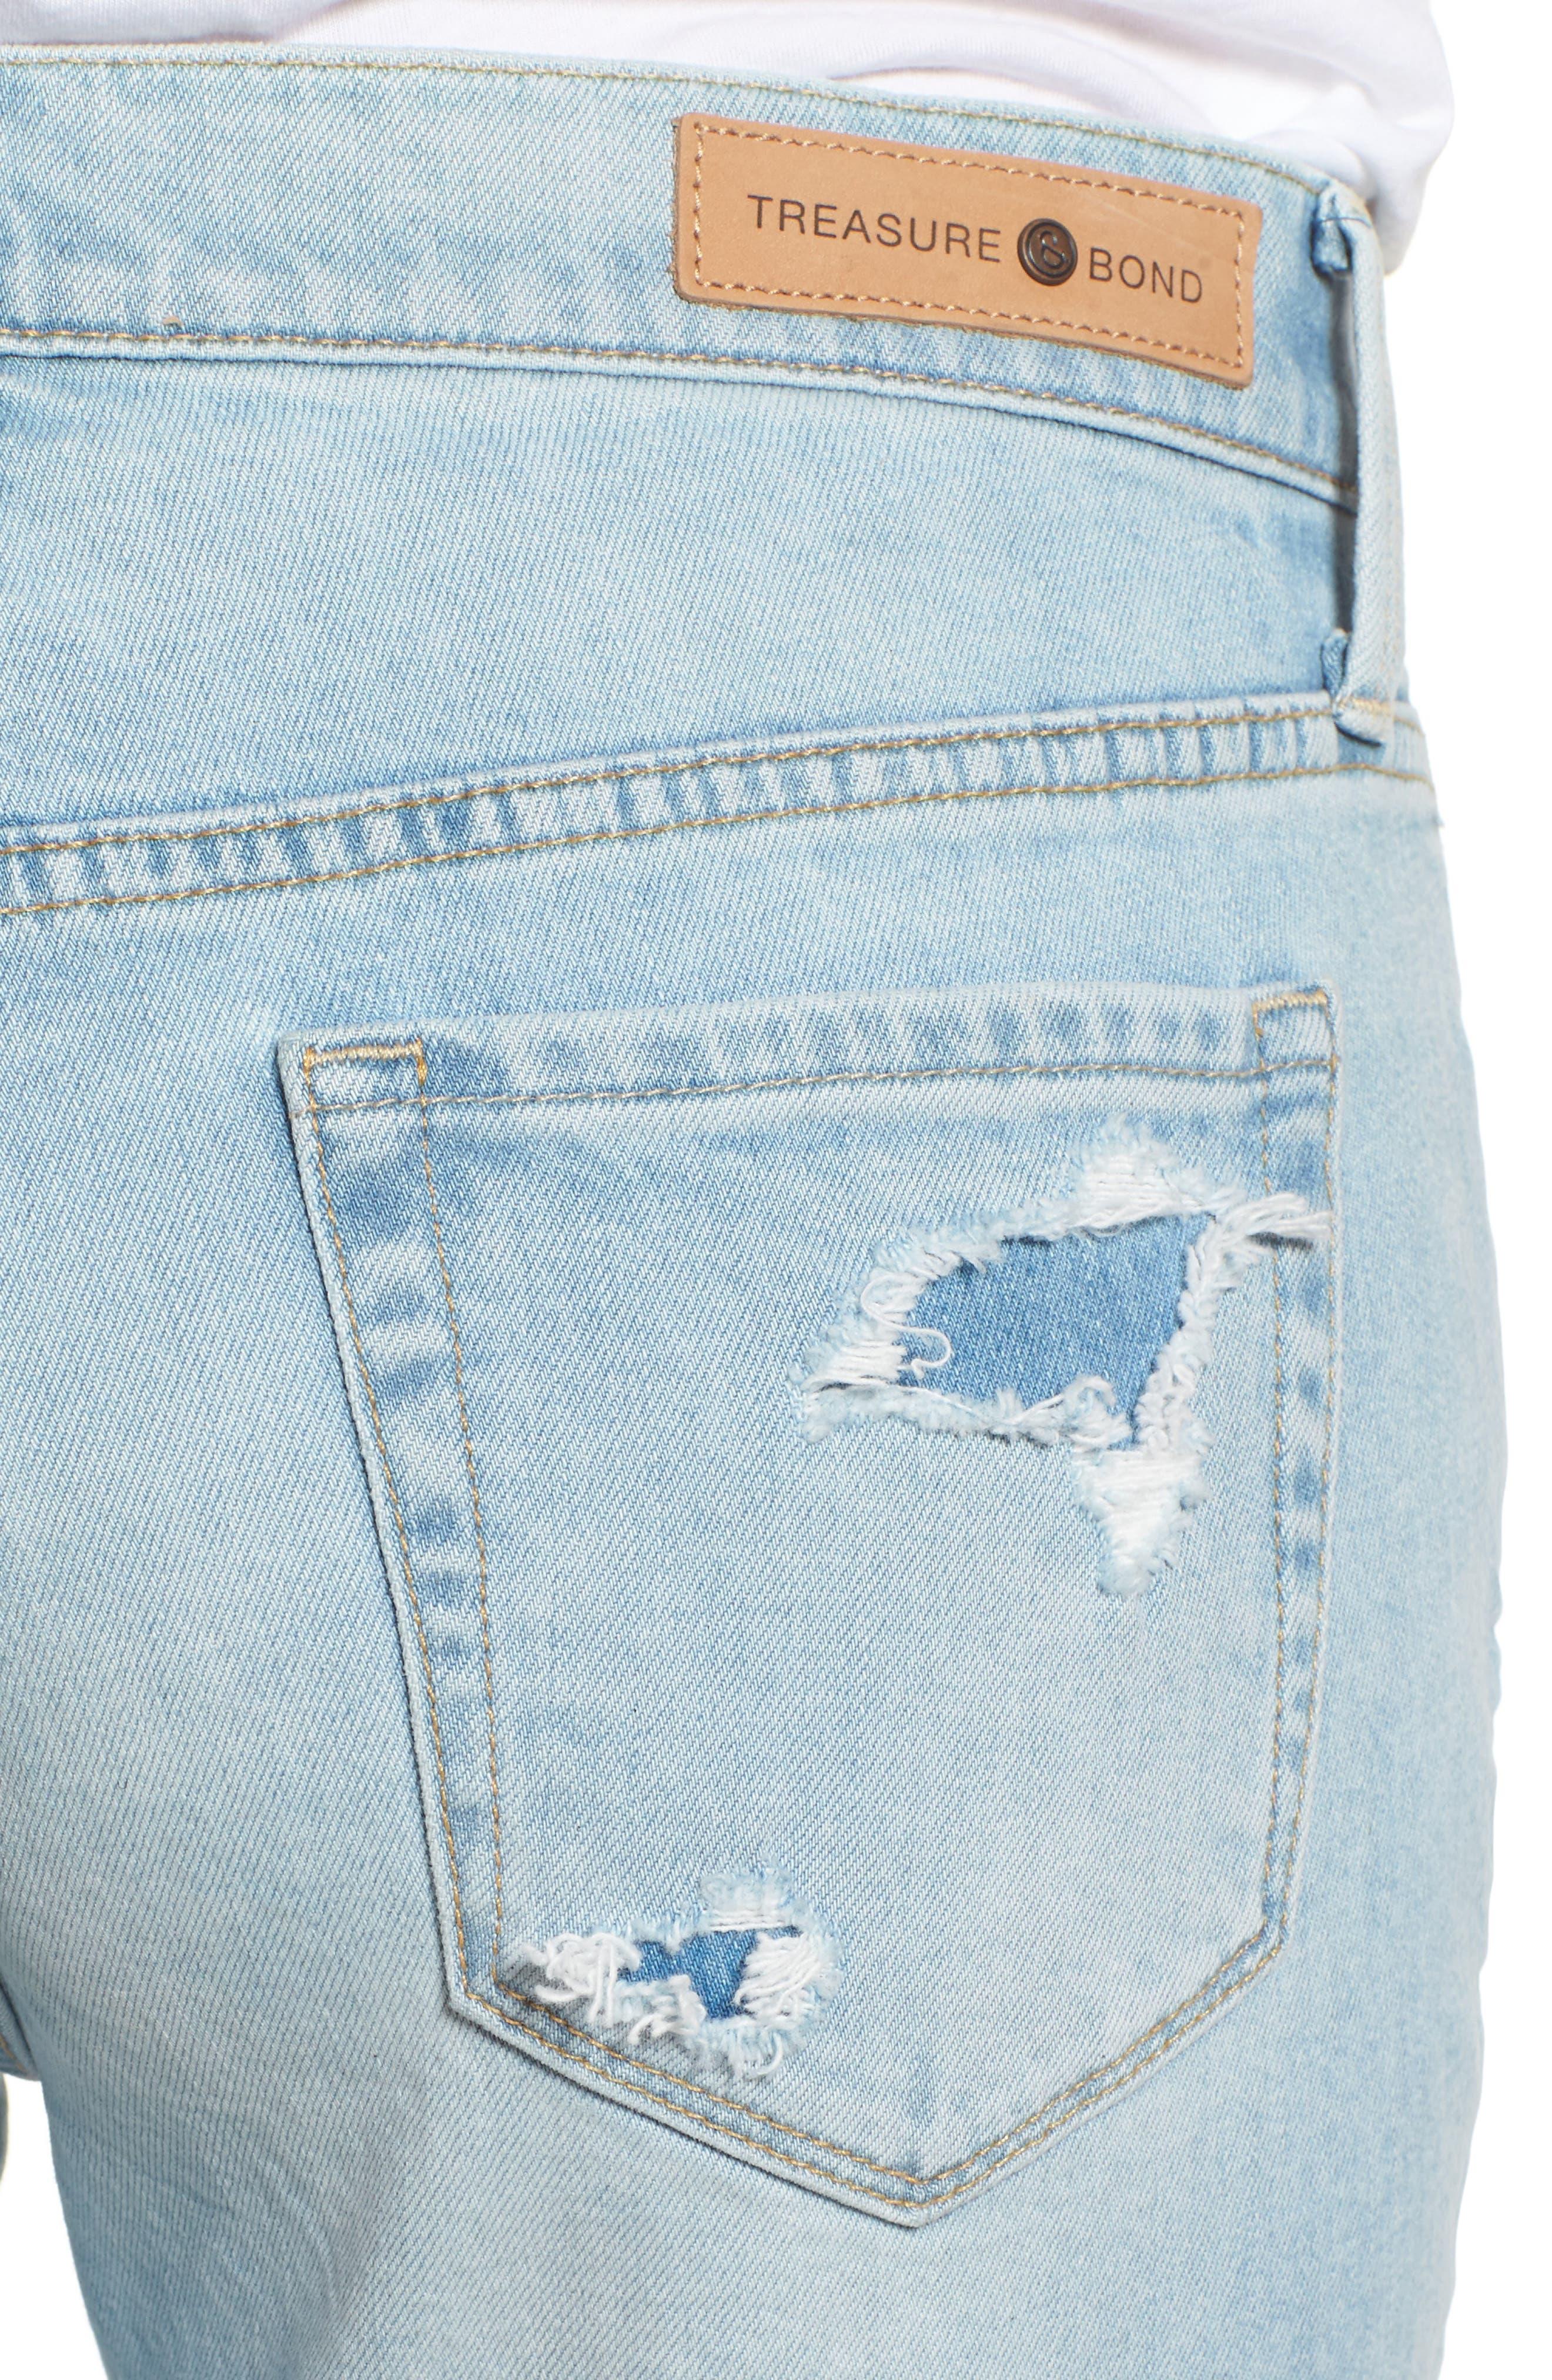 TREASURE & BOND,                             Skinny Boyfriend Jeans,                             Alternate thumbnail 4, color,                             400